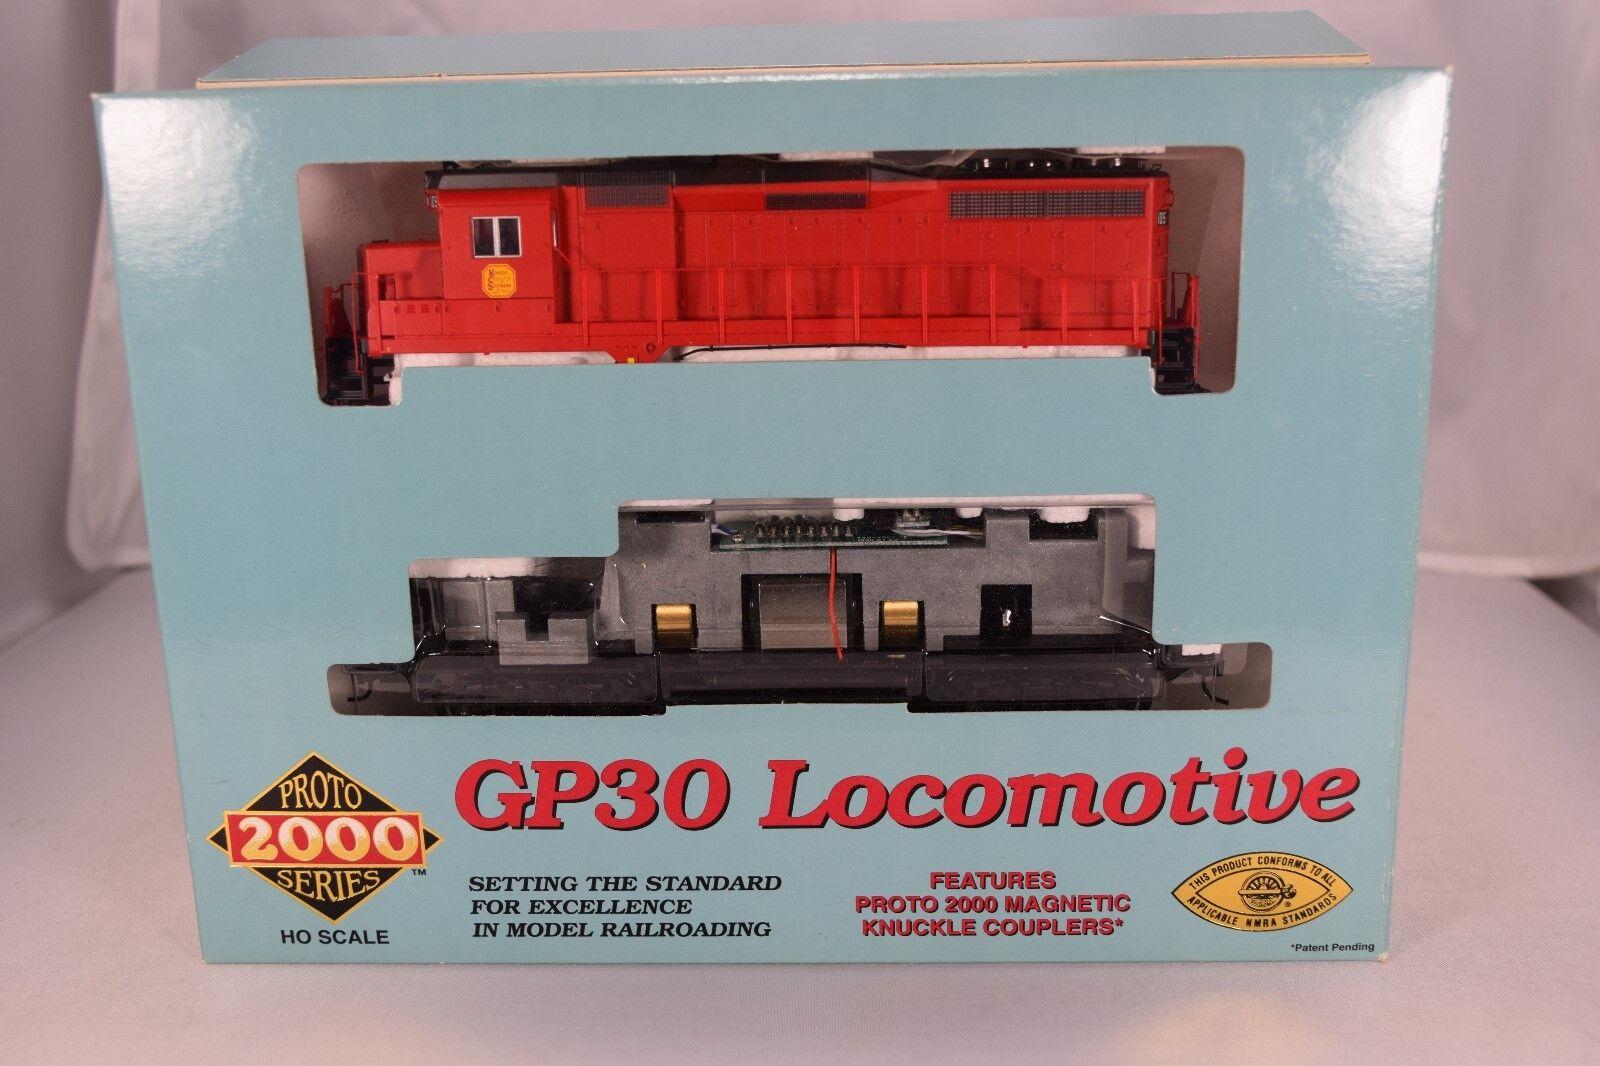 Life-like predo 2000 gp-30 locomotive new kcs-105 + 4 new axles changed